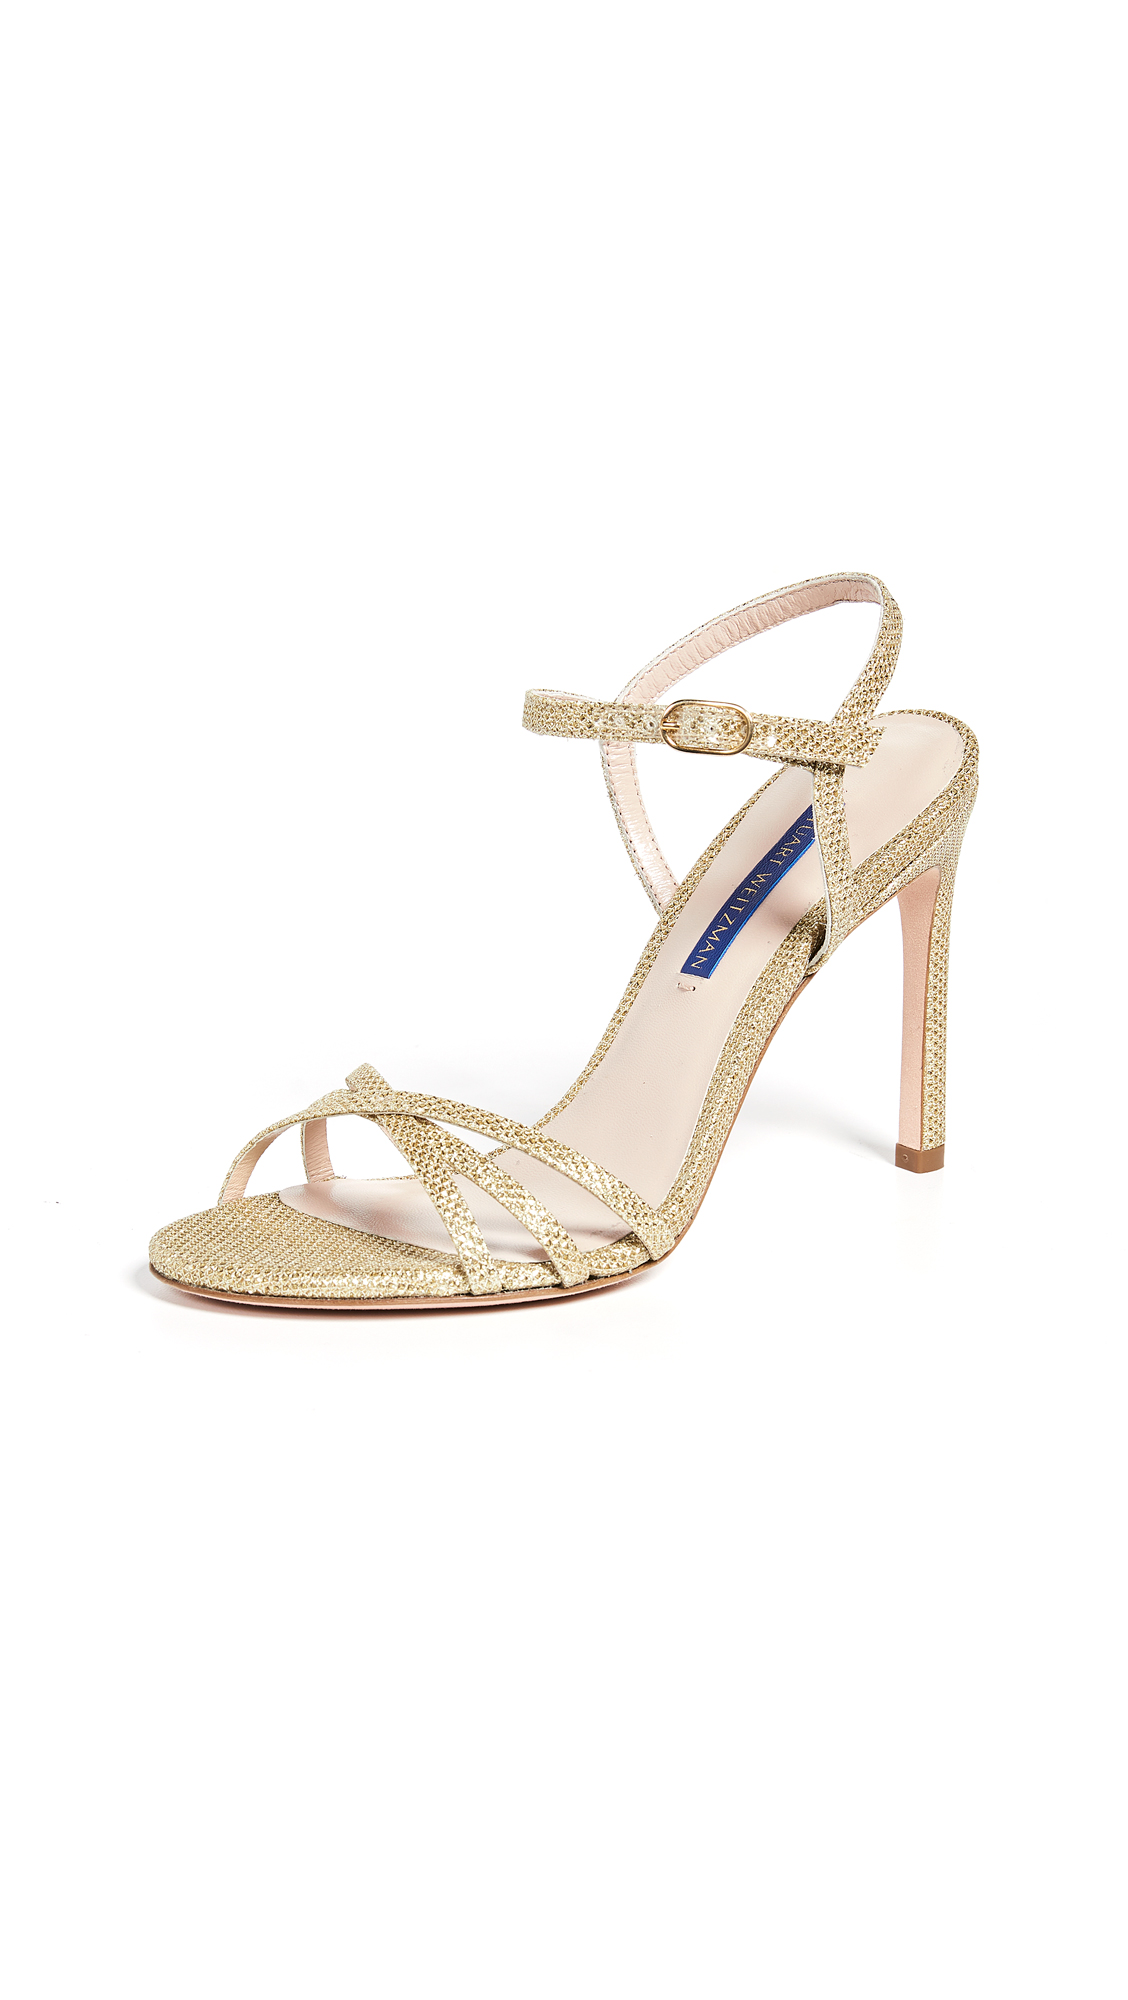 Stuart Weitzman Starla 105 Sandals - Gold